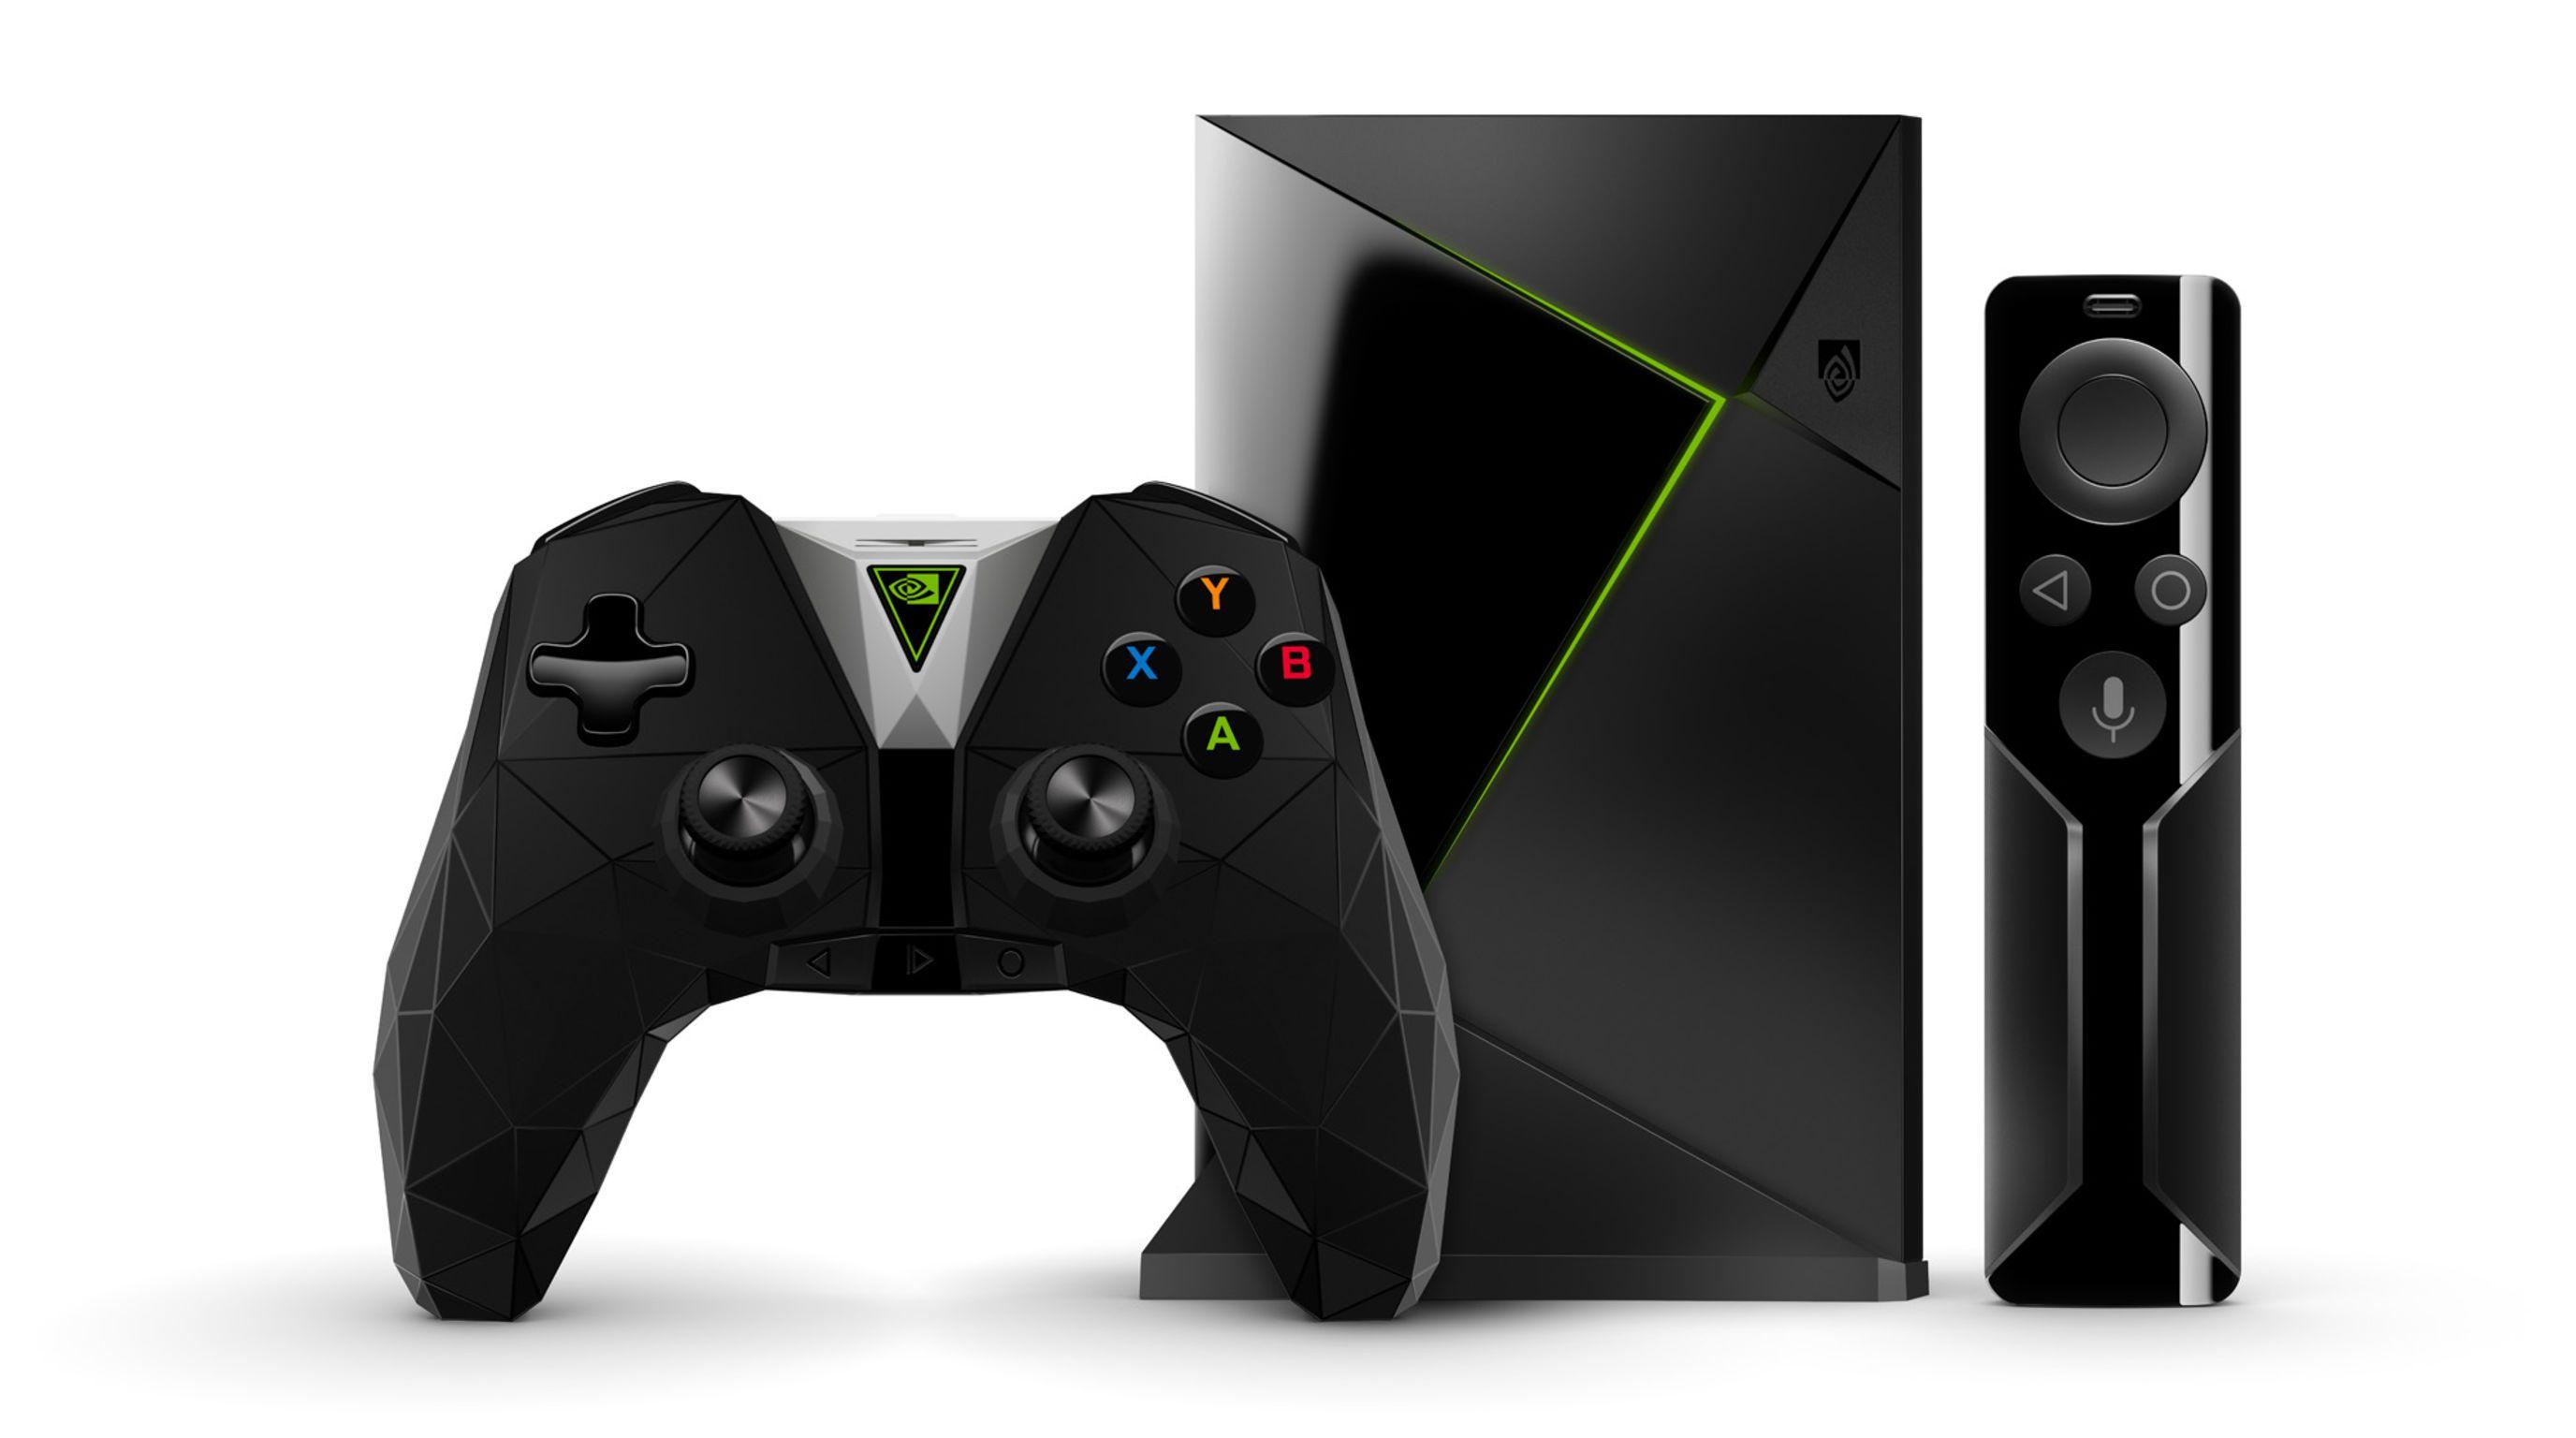 SHIELD TV Nvidia shield, Nvidia, Download video games